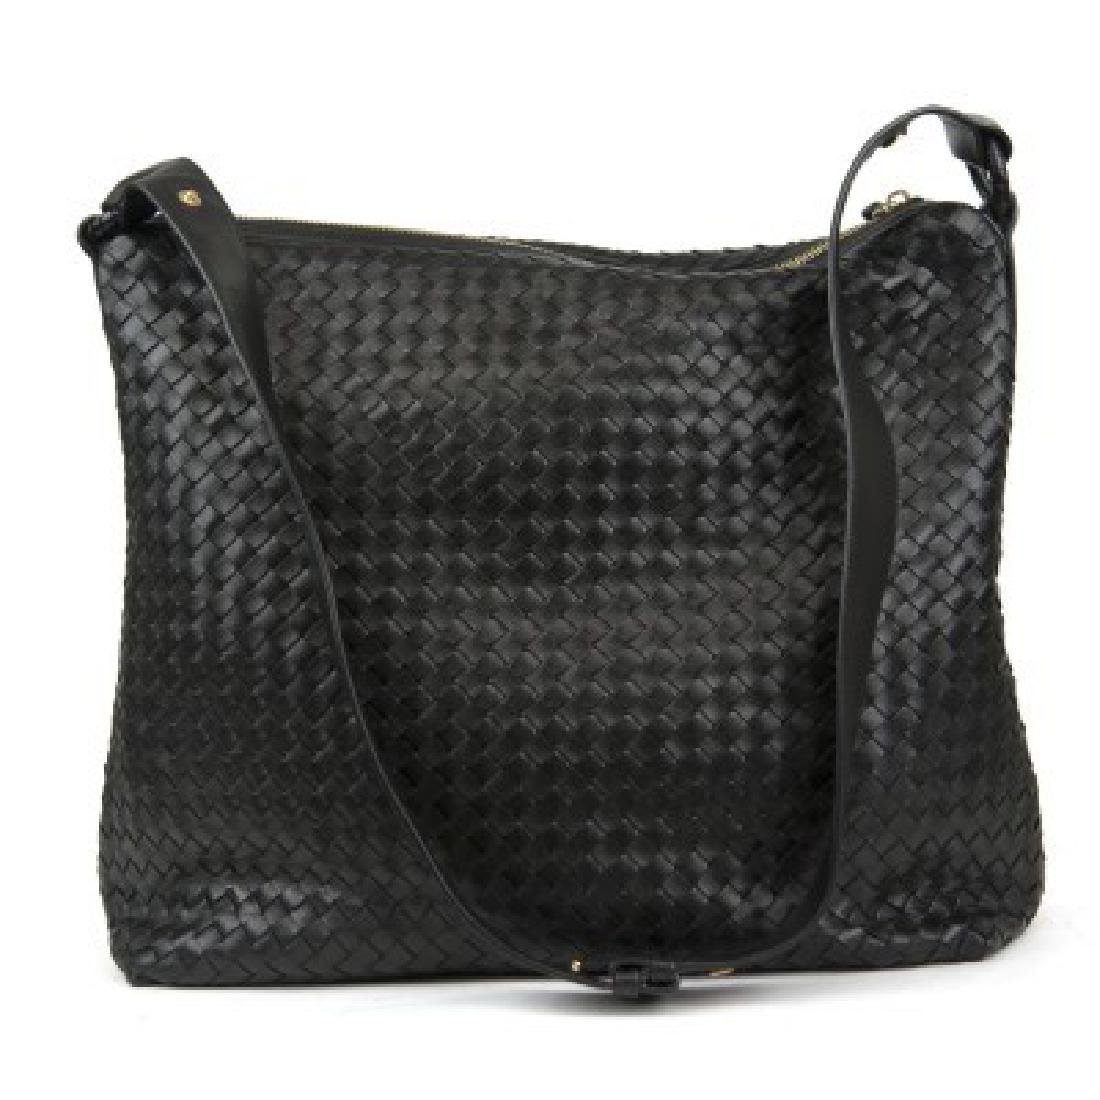 Bottega Veneta Iconic Messenger Handbag